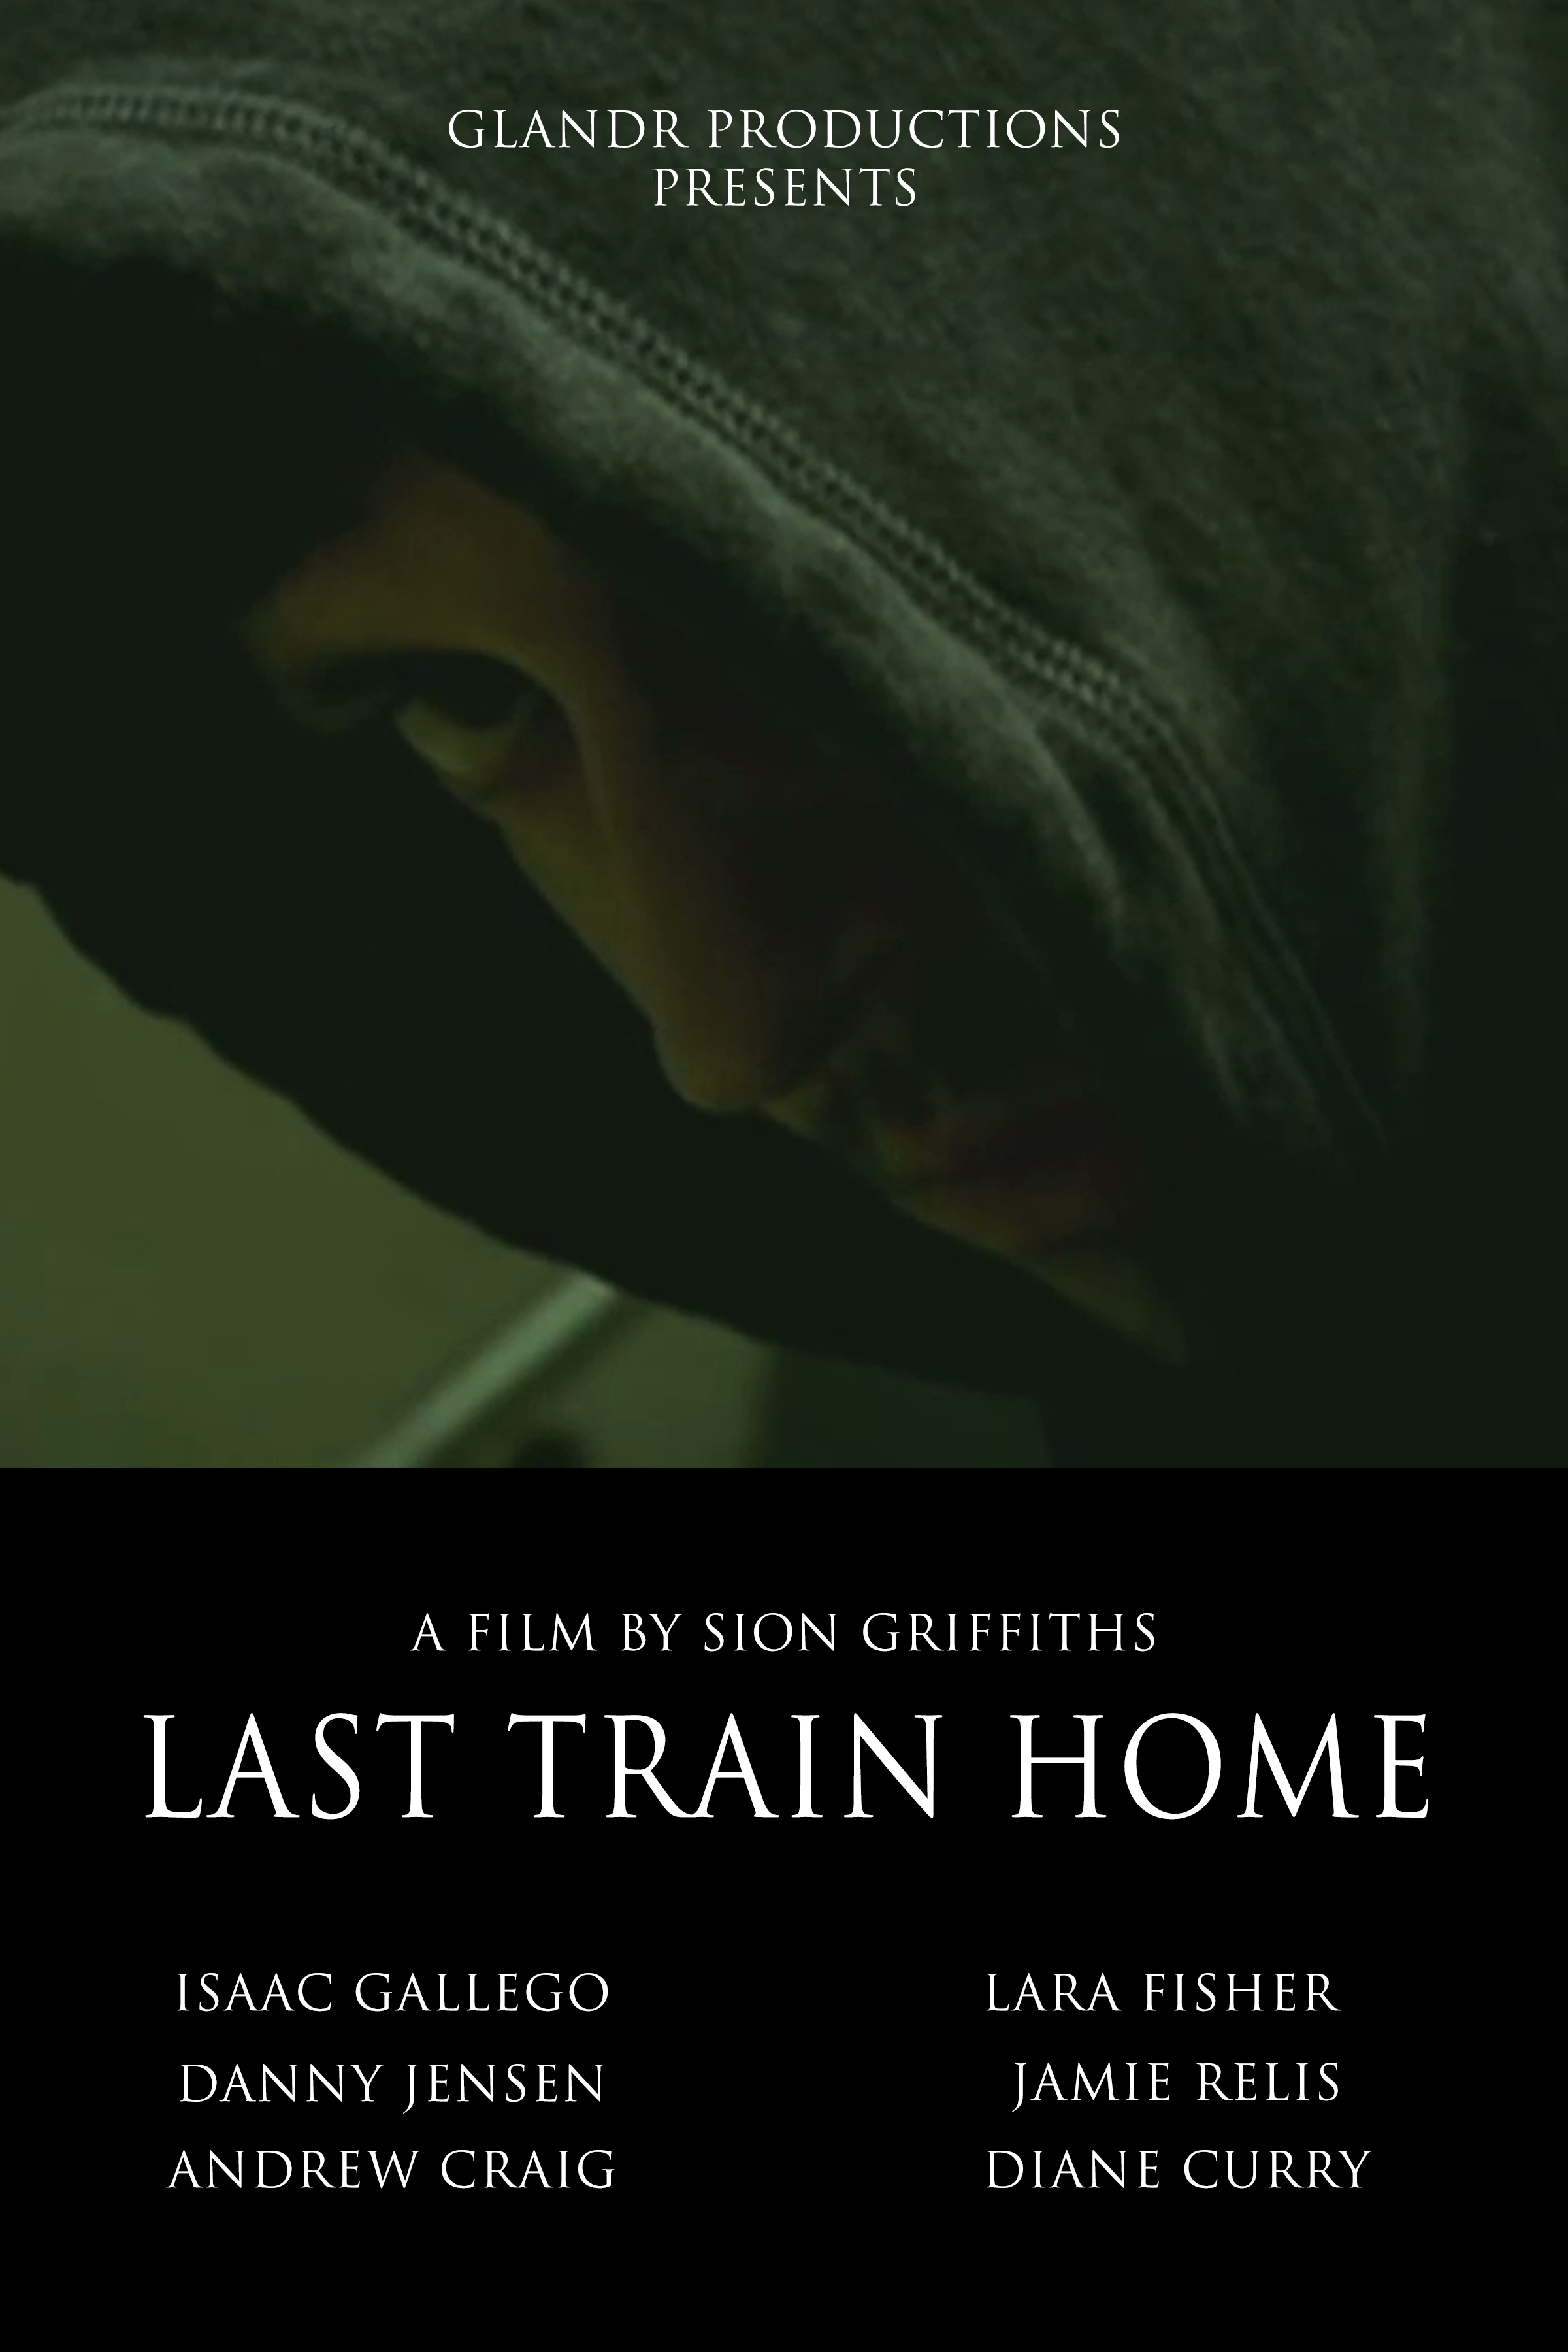 Last train home POSTER_FINAL.jpg